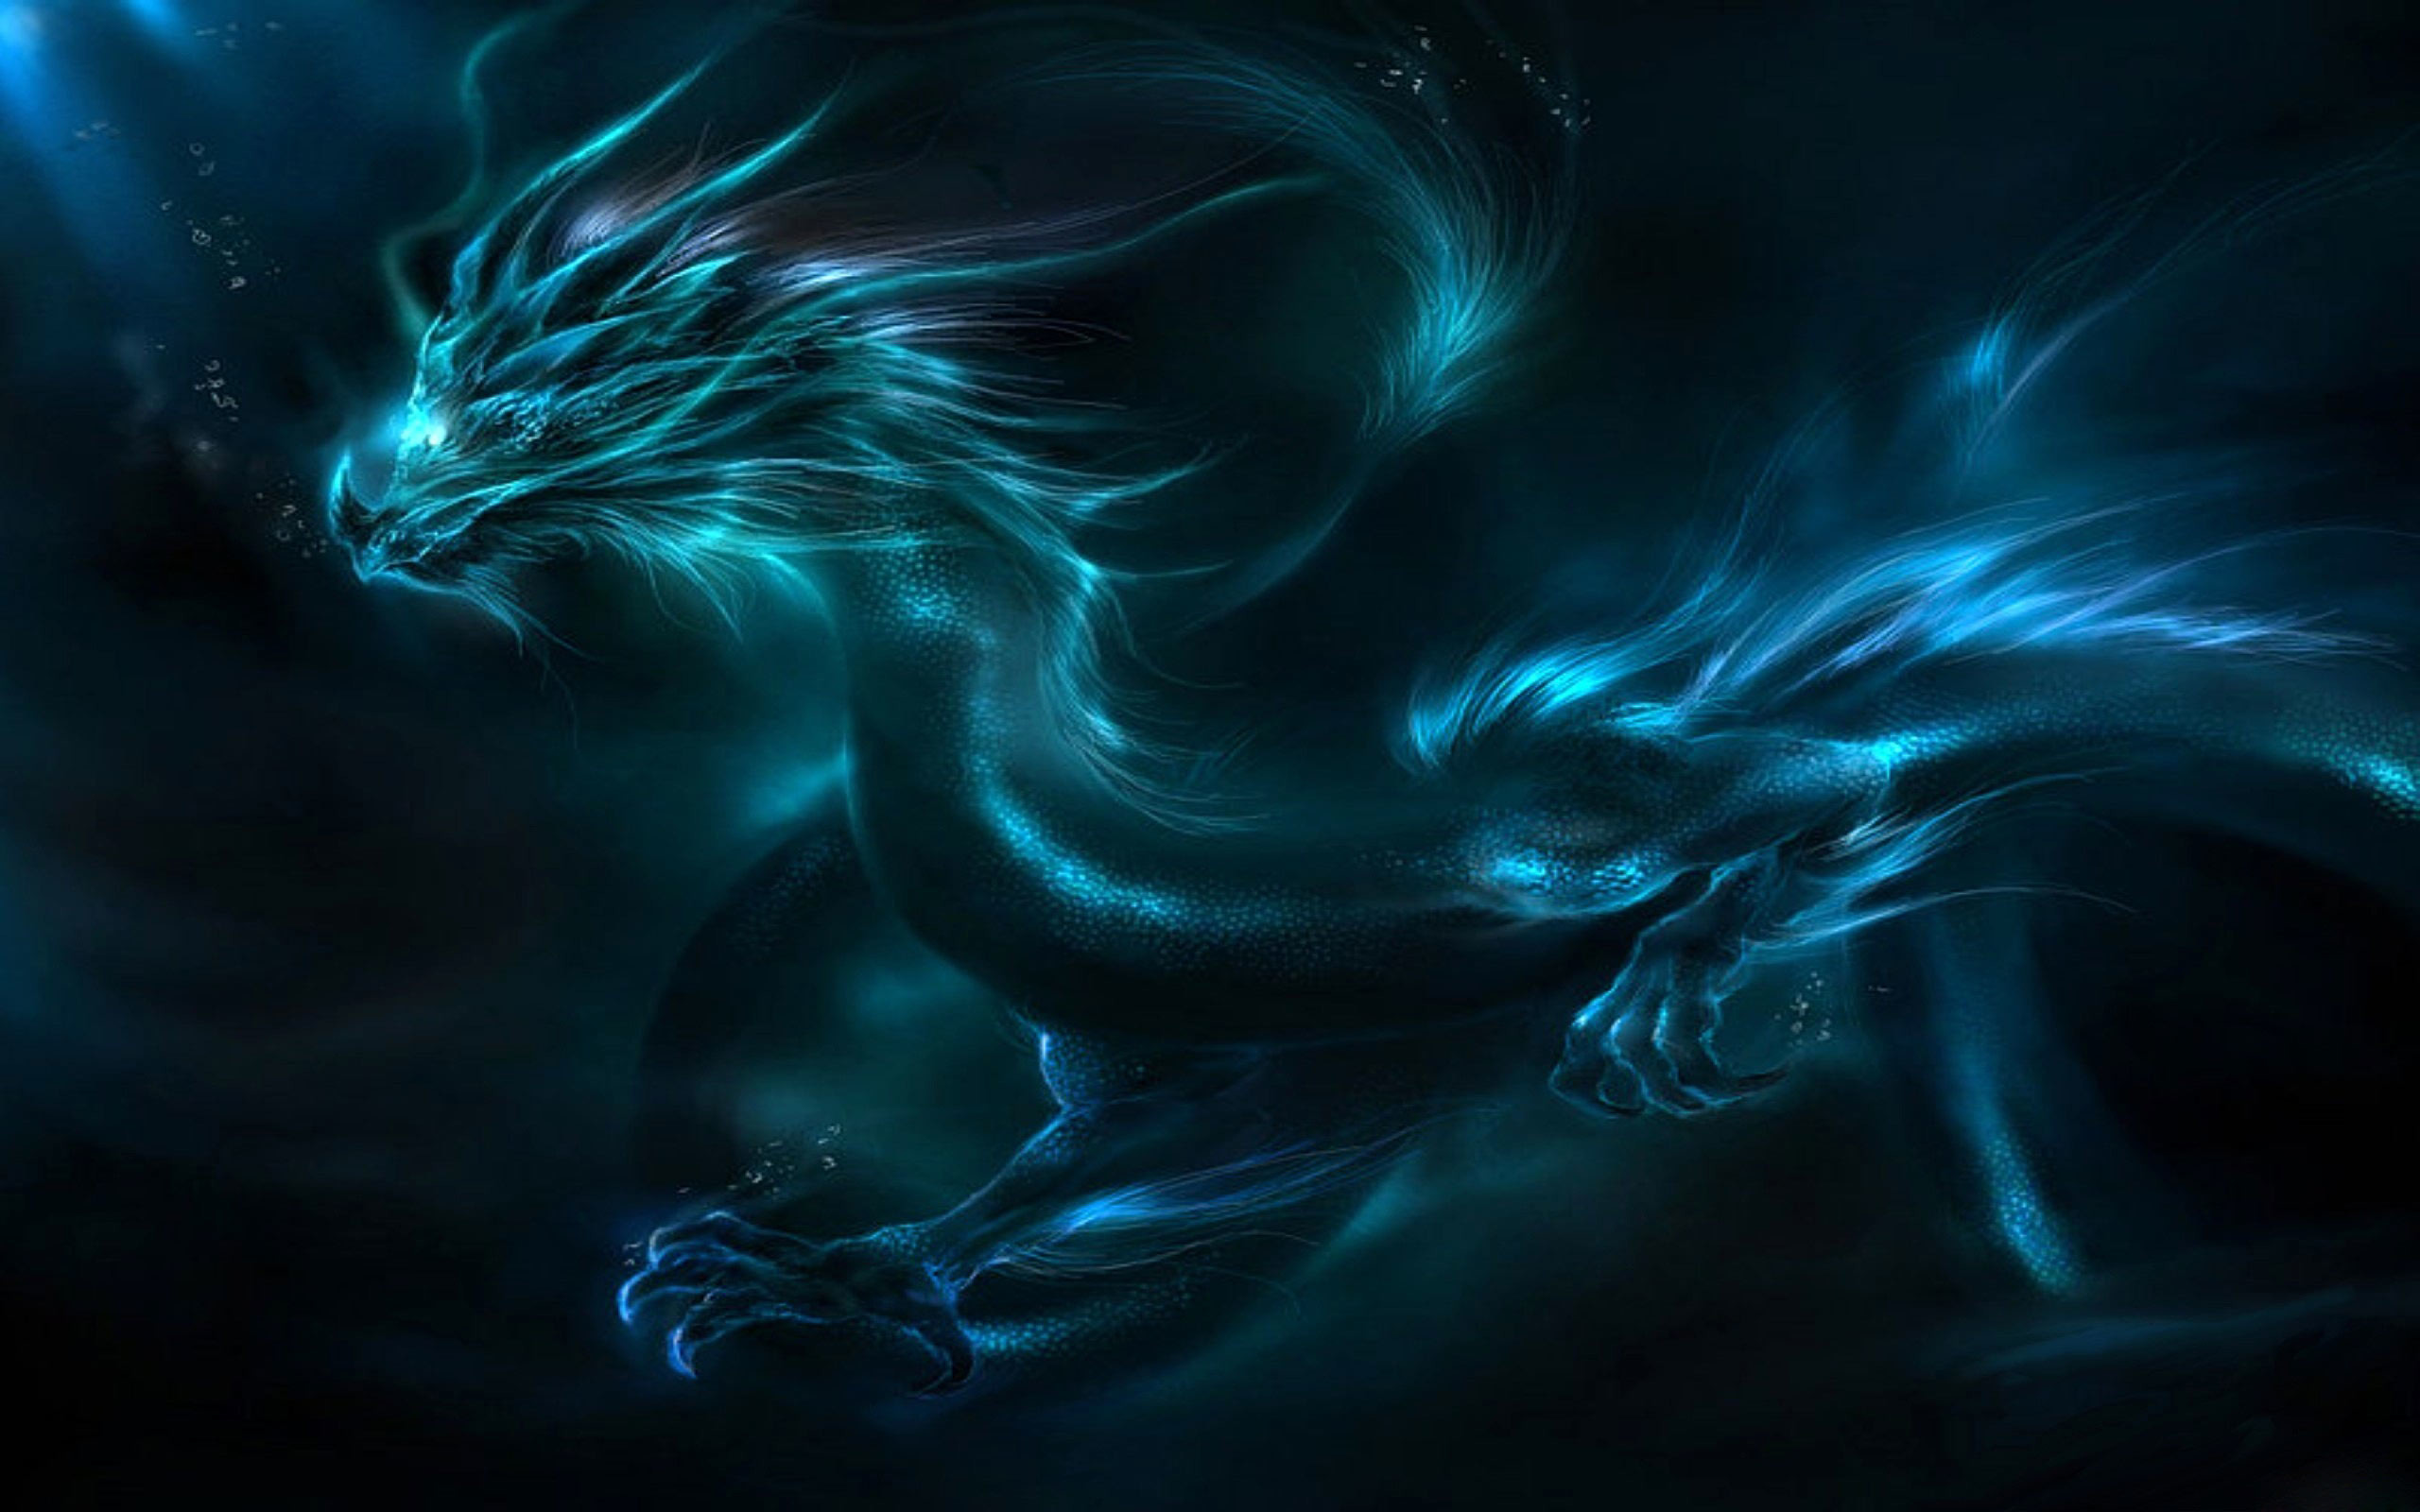 Fantasy Wallpaper: Blue Dragon Wallpaper Images for Desktop Background  Wallpaper HD Resolution